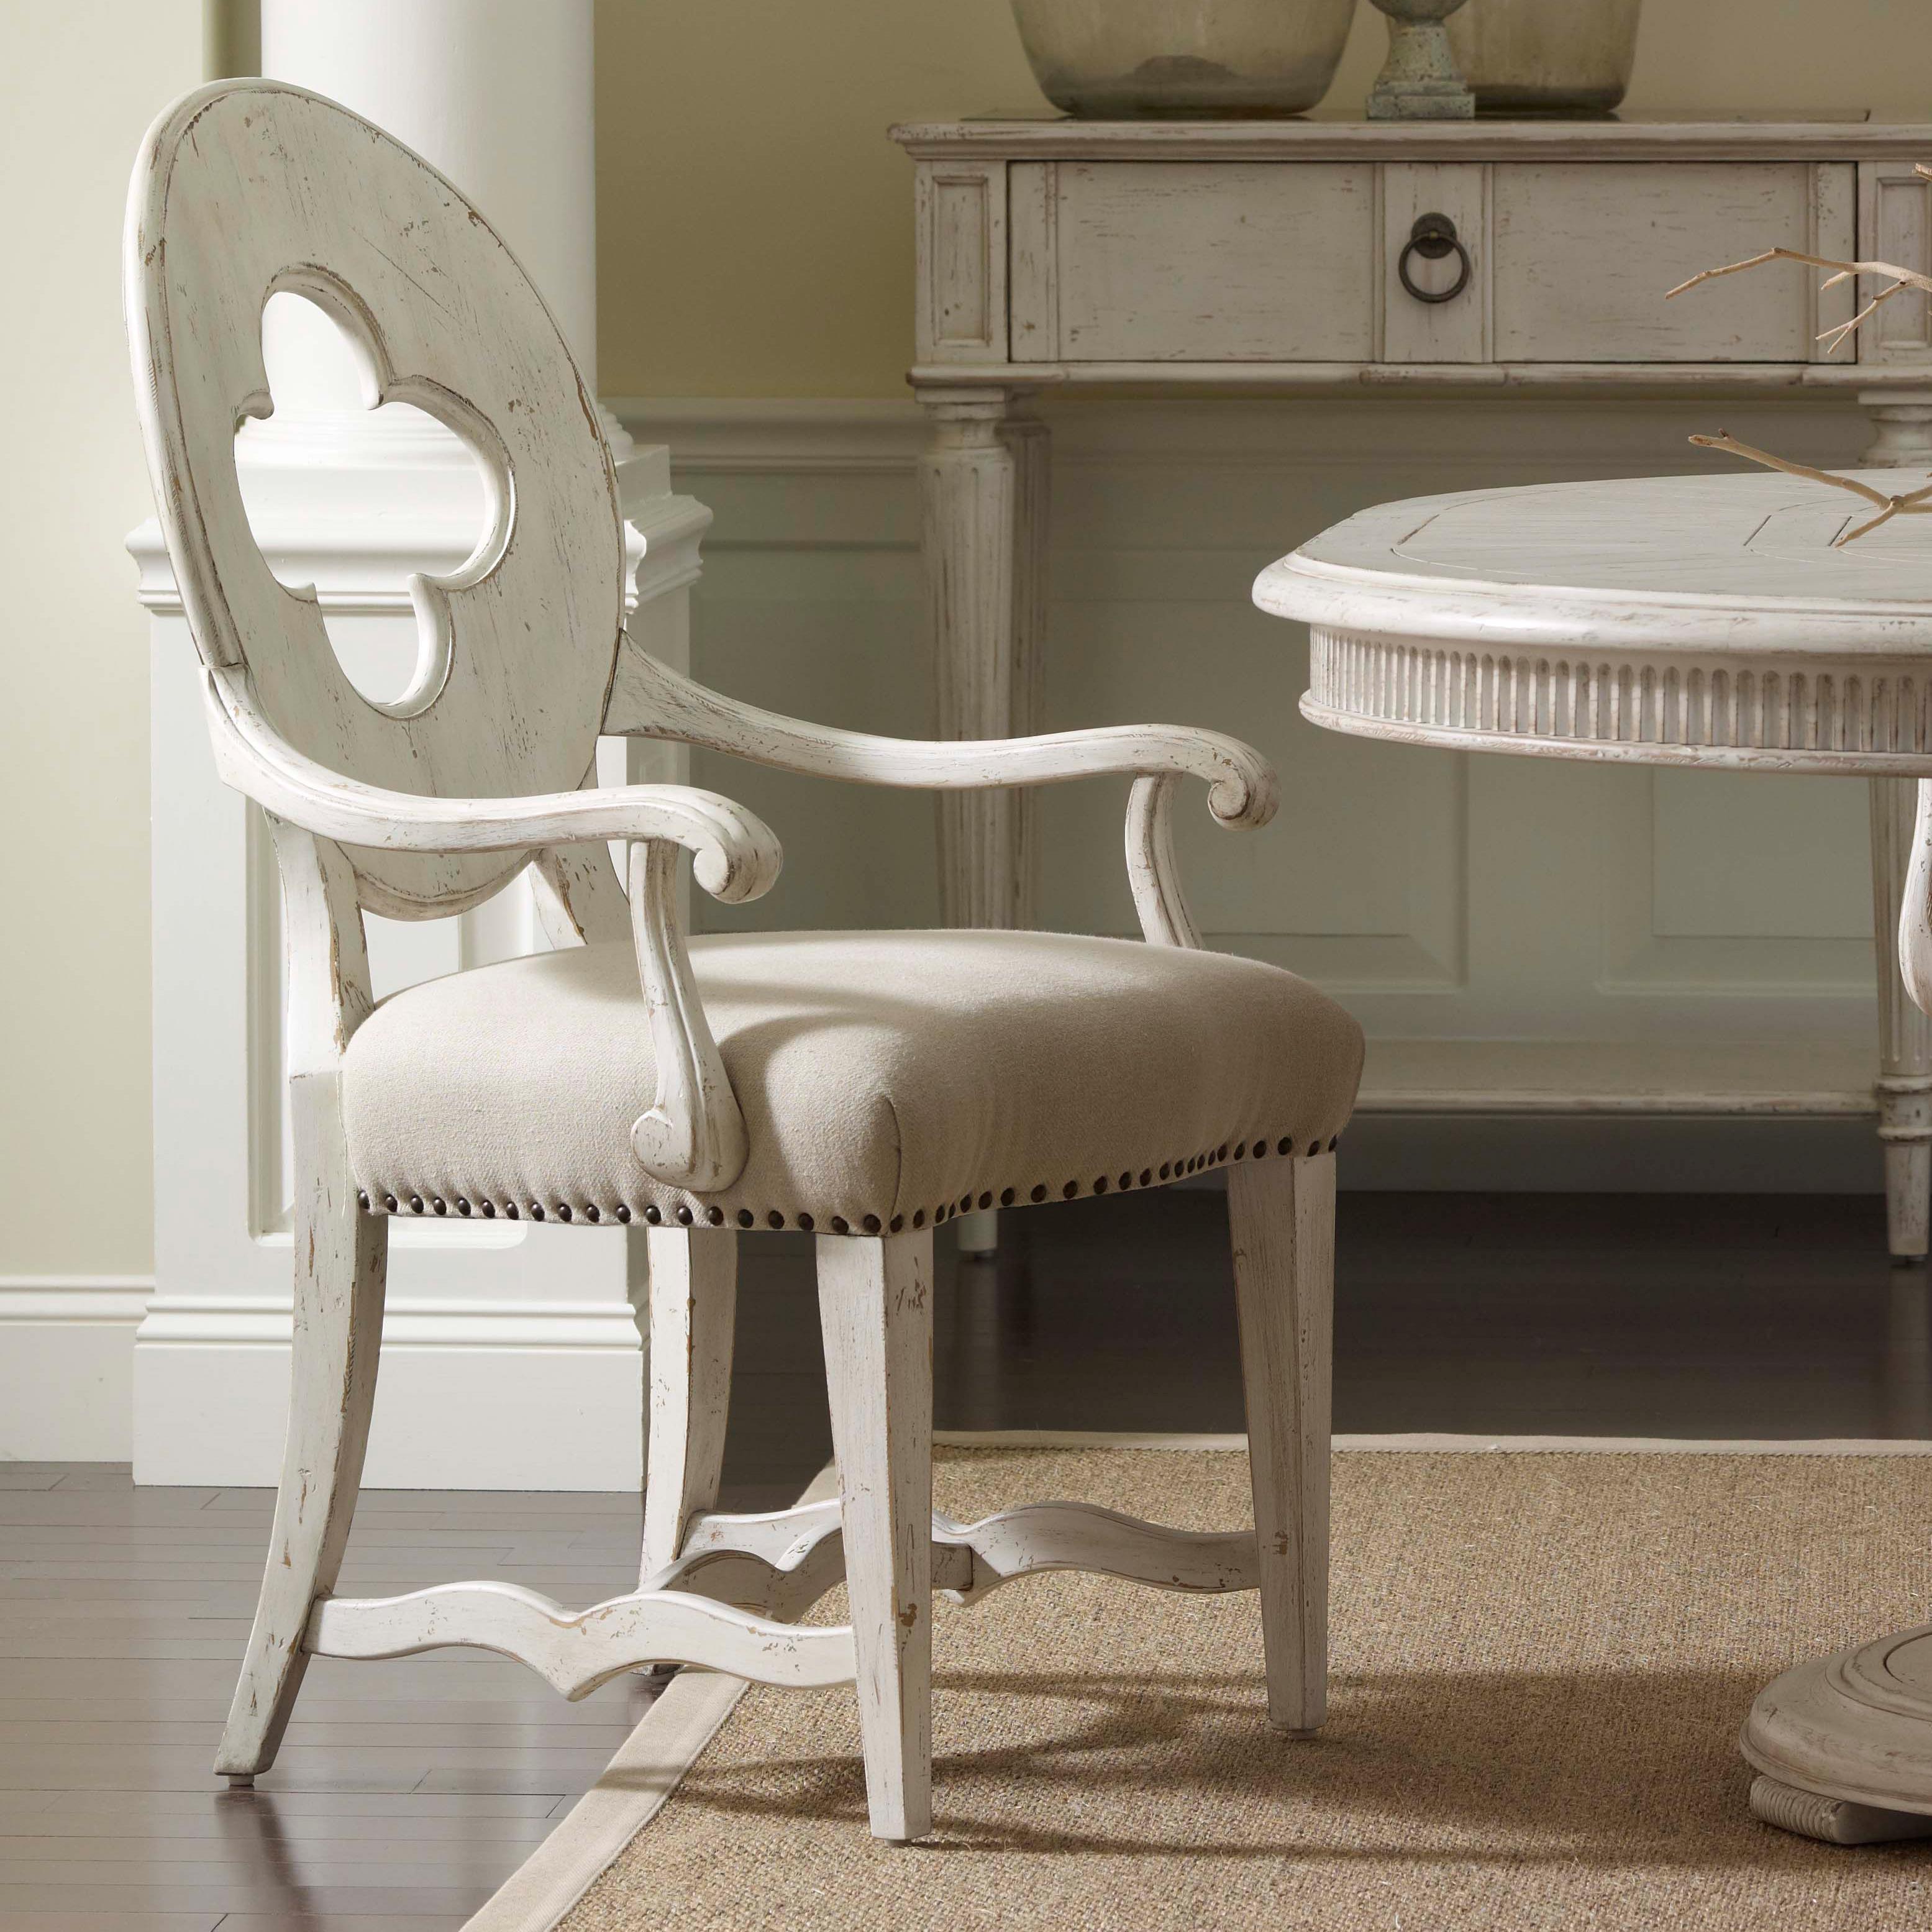 Belfort Signature Belle Haven Drake Arm Chair - Item Number: 217201-2617